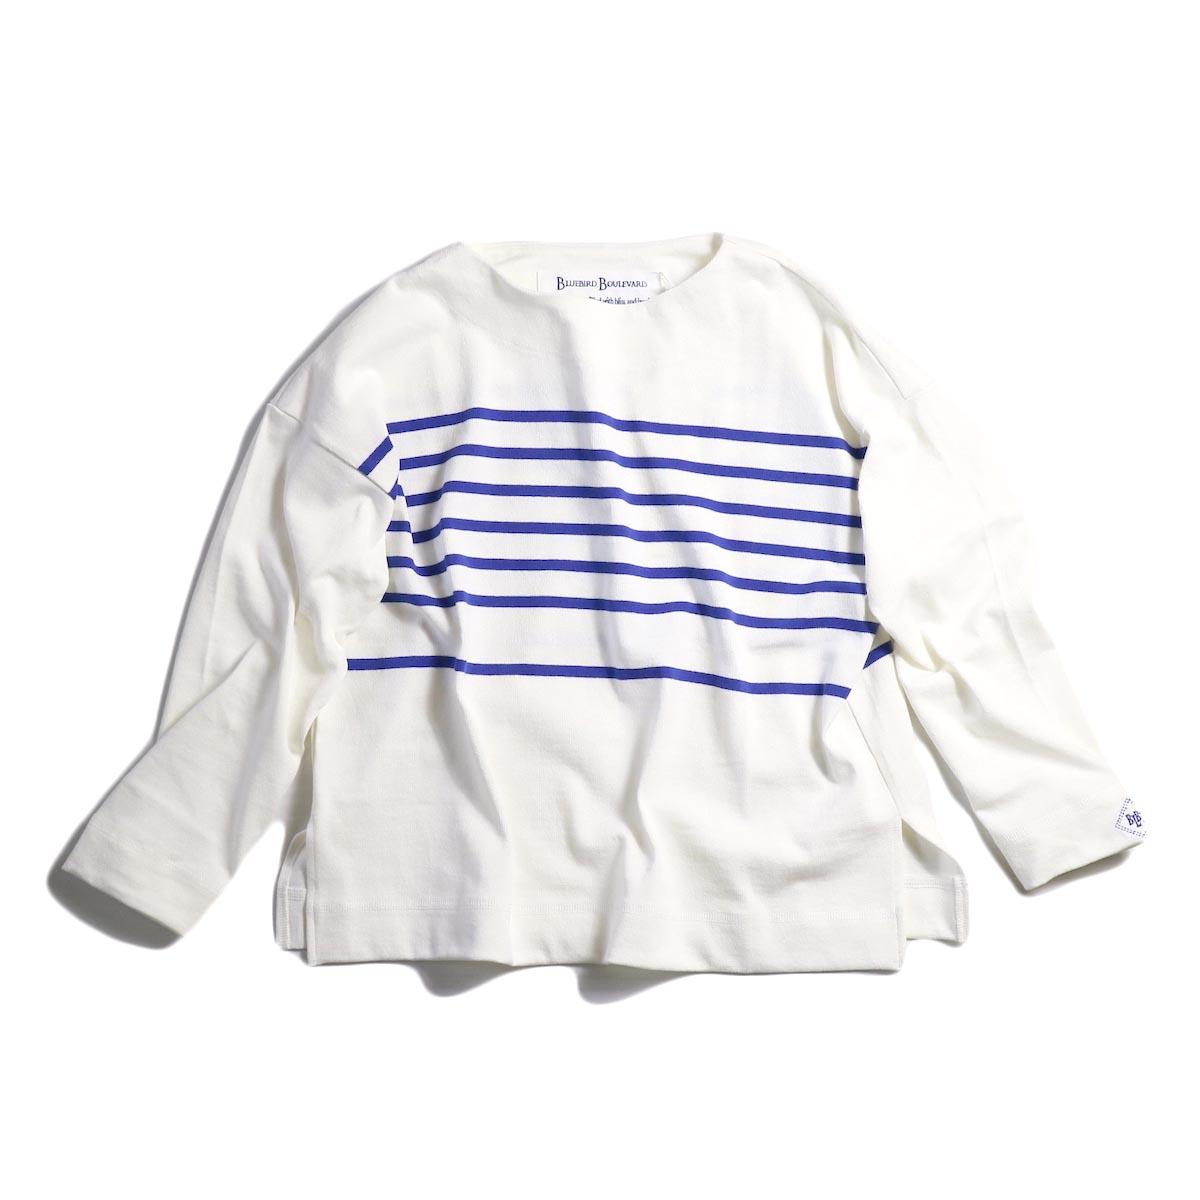 BLUEBIRD BOULEVARD / ロングスリーブボーダーバスクシャツ (タイト) WHITE / BLUE